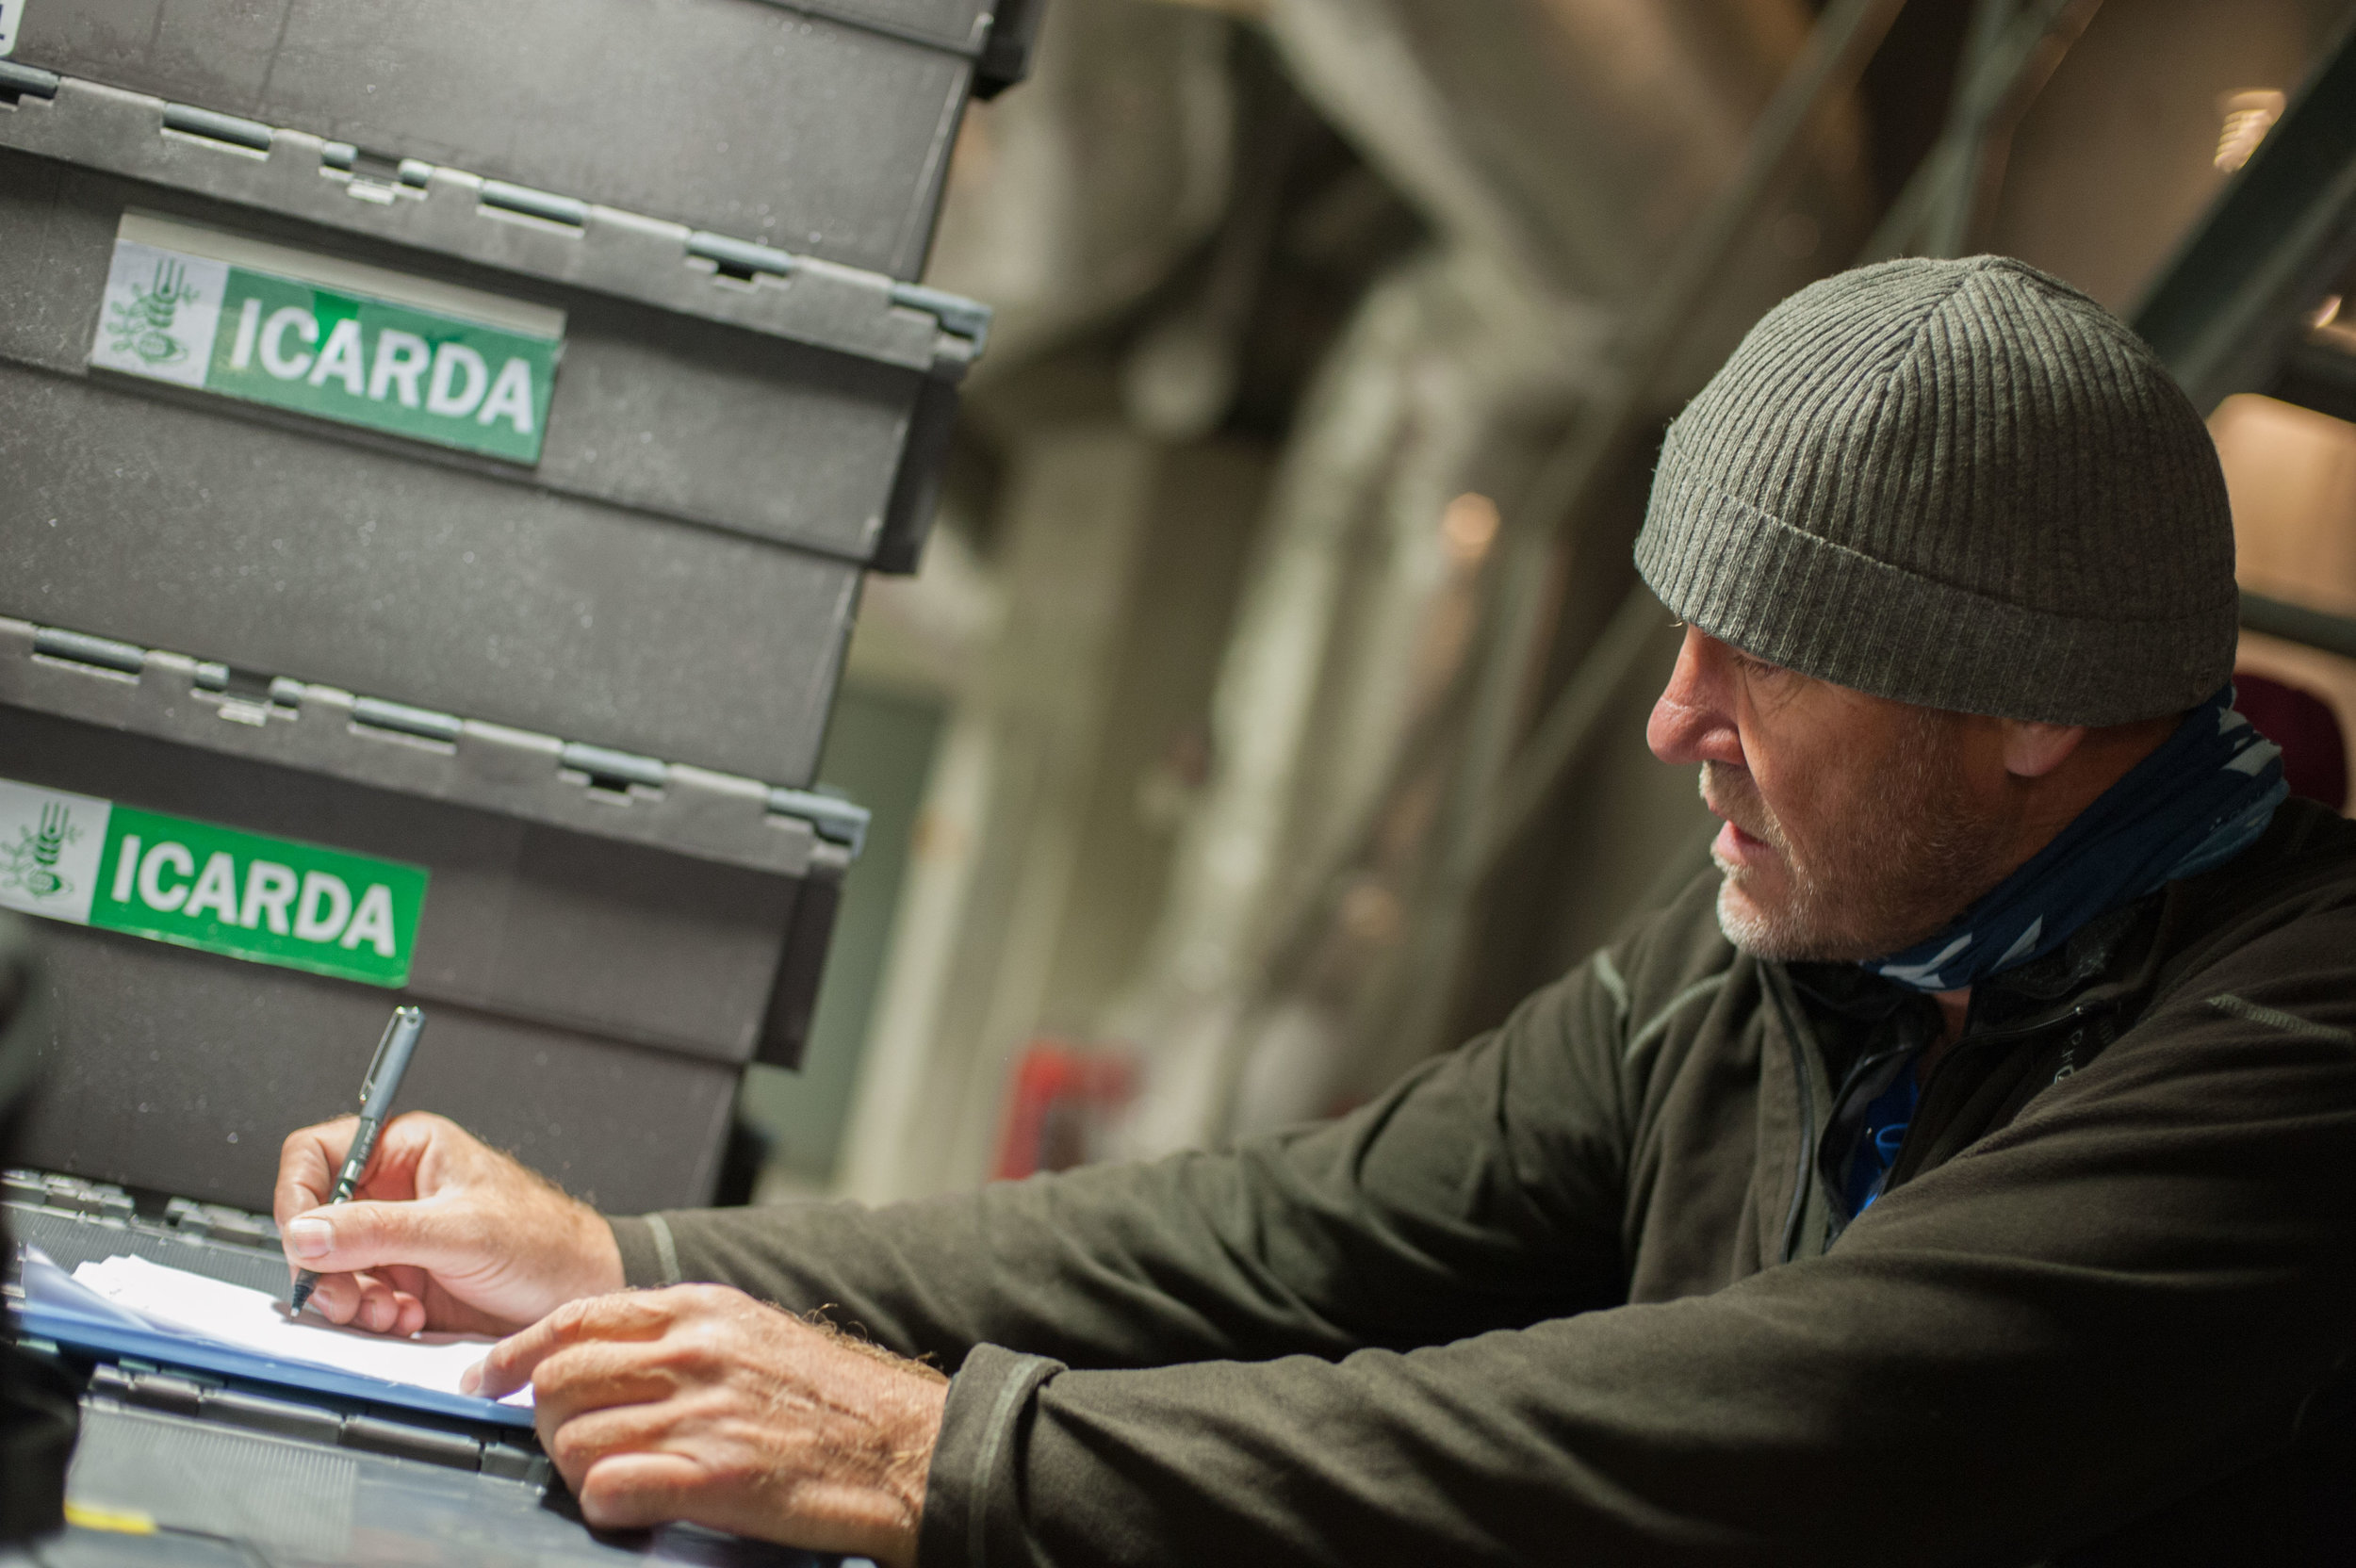 Åsmund Asdal registrering newly arrived seeds. Photo: Riccardo Gangale, Landbruks-og matdepartementet.